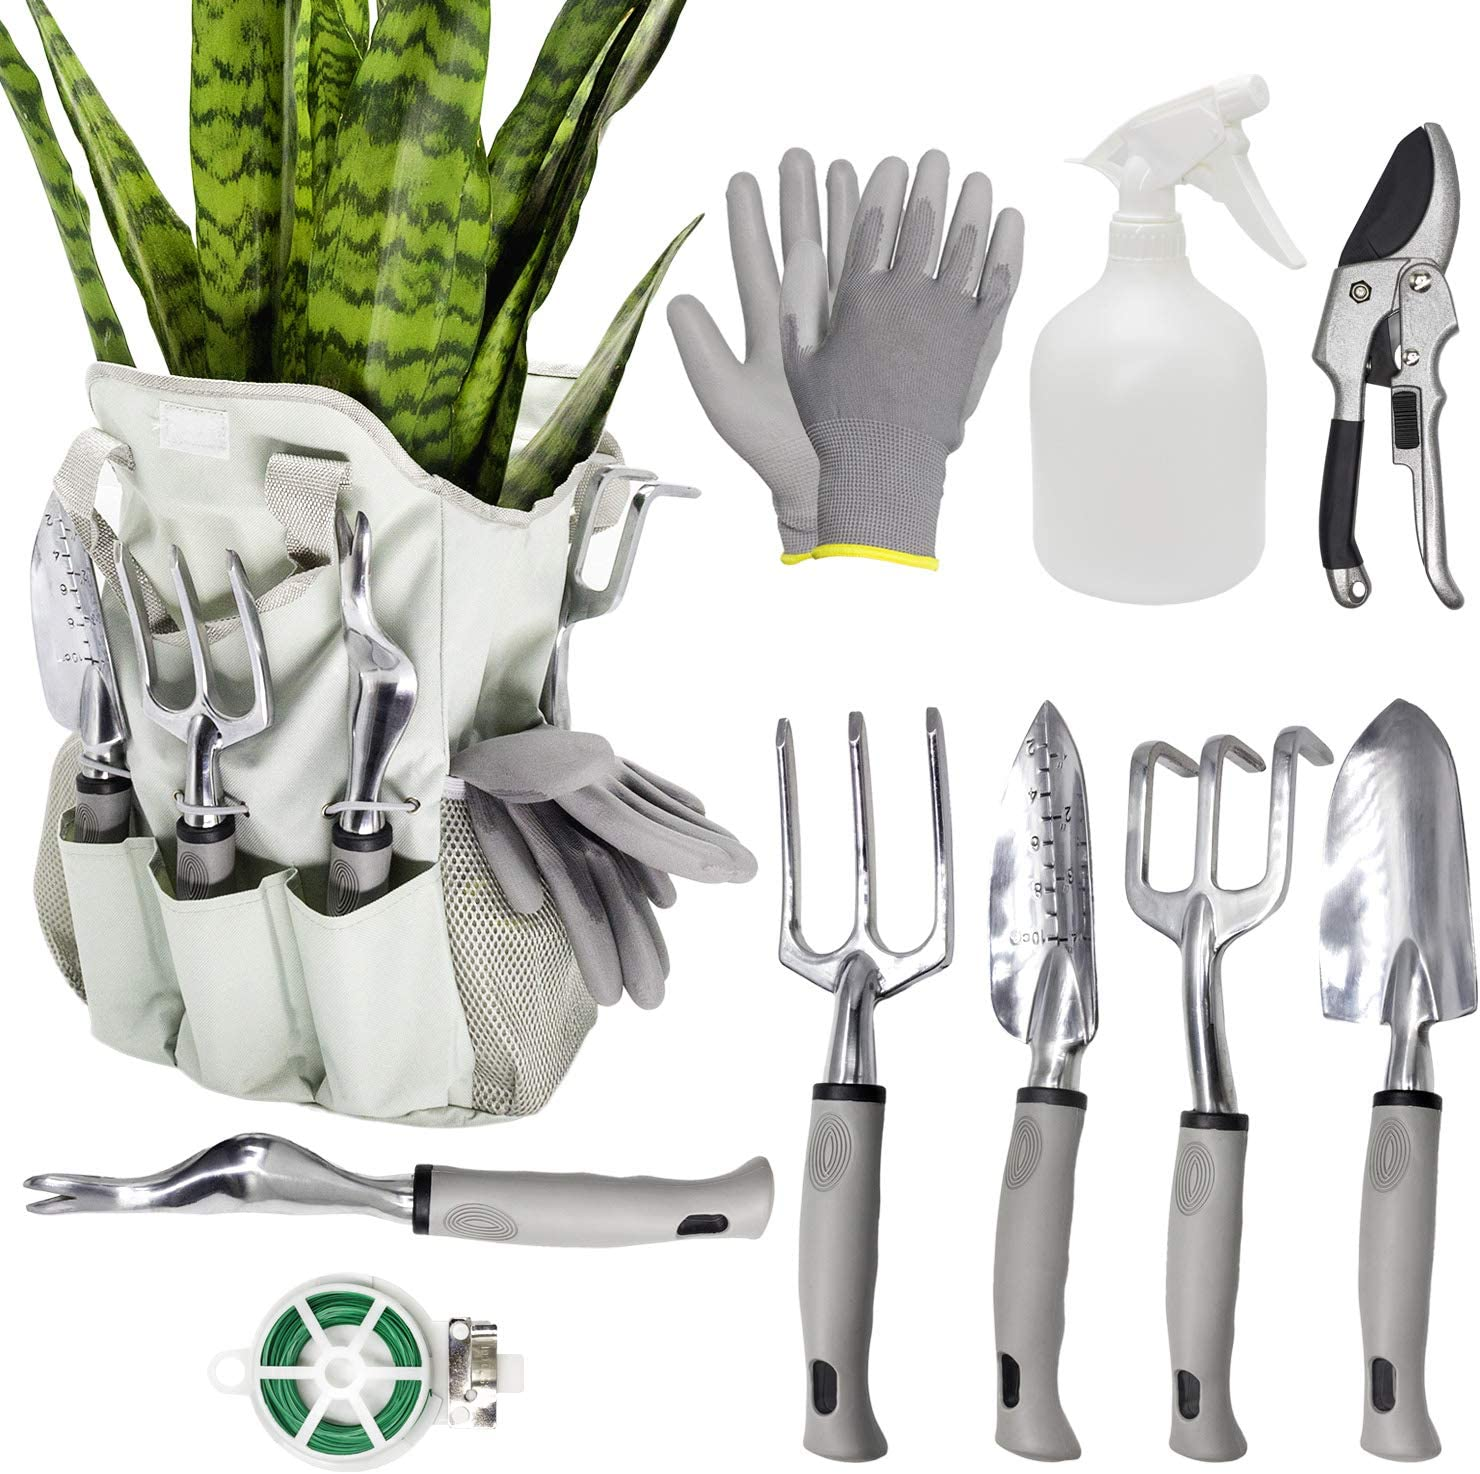 FALIDI Garden Tools Set 8 Piece Gardening Tools Kit,Garden Gloves and Garden Handbag,Hand Digging Weeder Rake Shovel Trowel,Gardening Gifts for Woman-Gray